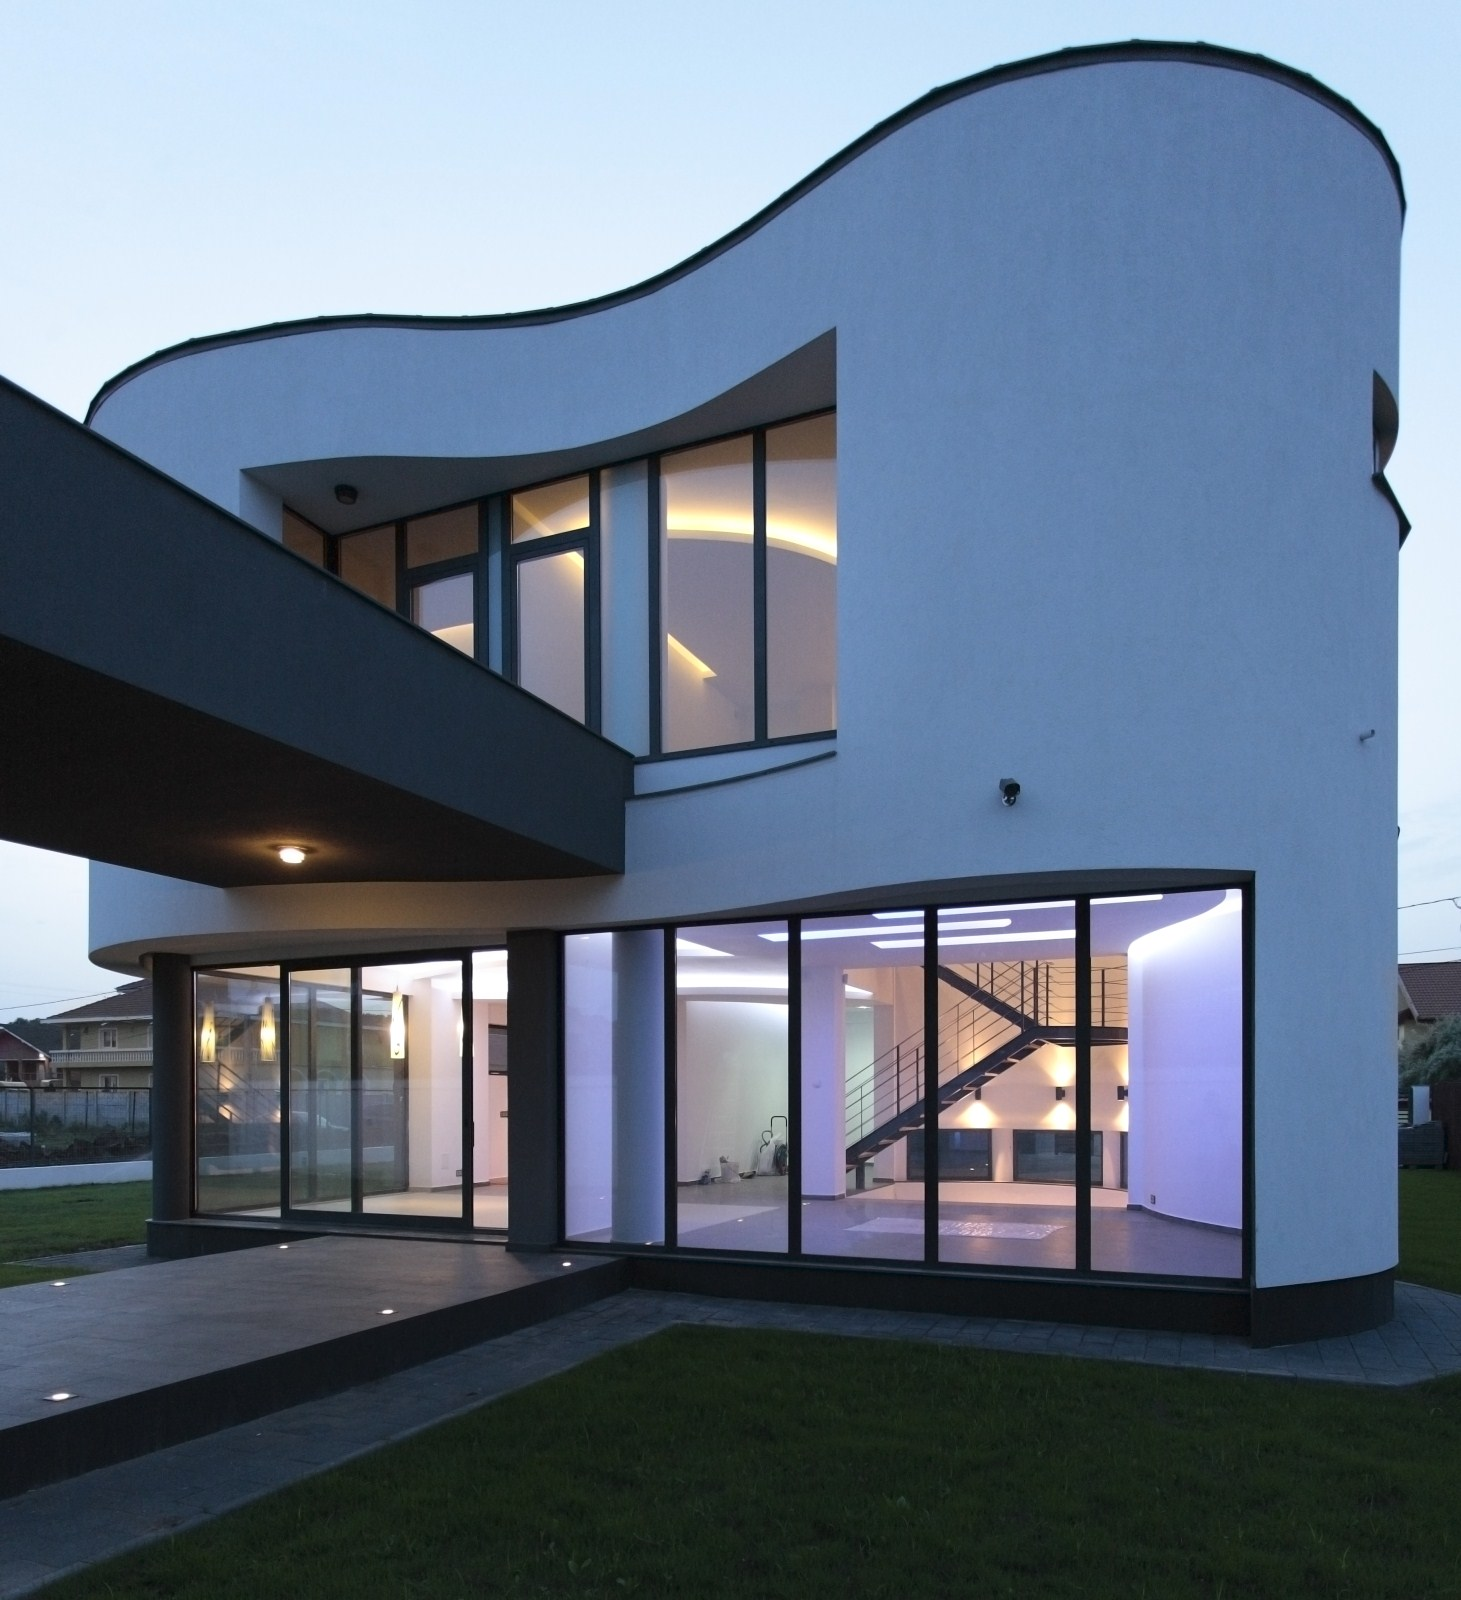 https://nbc-arhitect.ro/wp-content/uploads/2020/10/NBC-Arhitect-_-residences-_-Serban-House-Villa-_-Romania-_-exterior_view_7.jpg